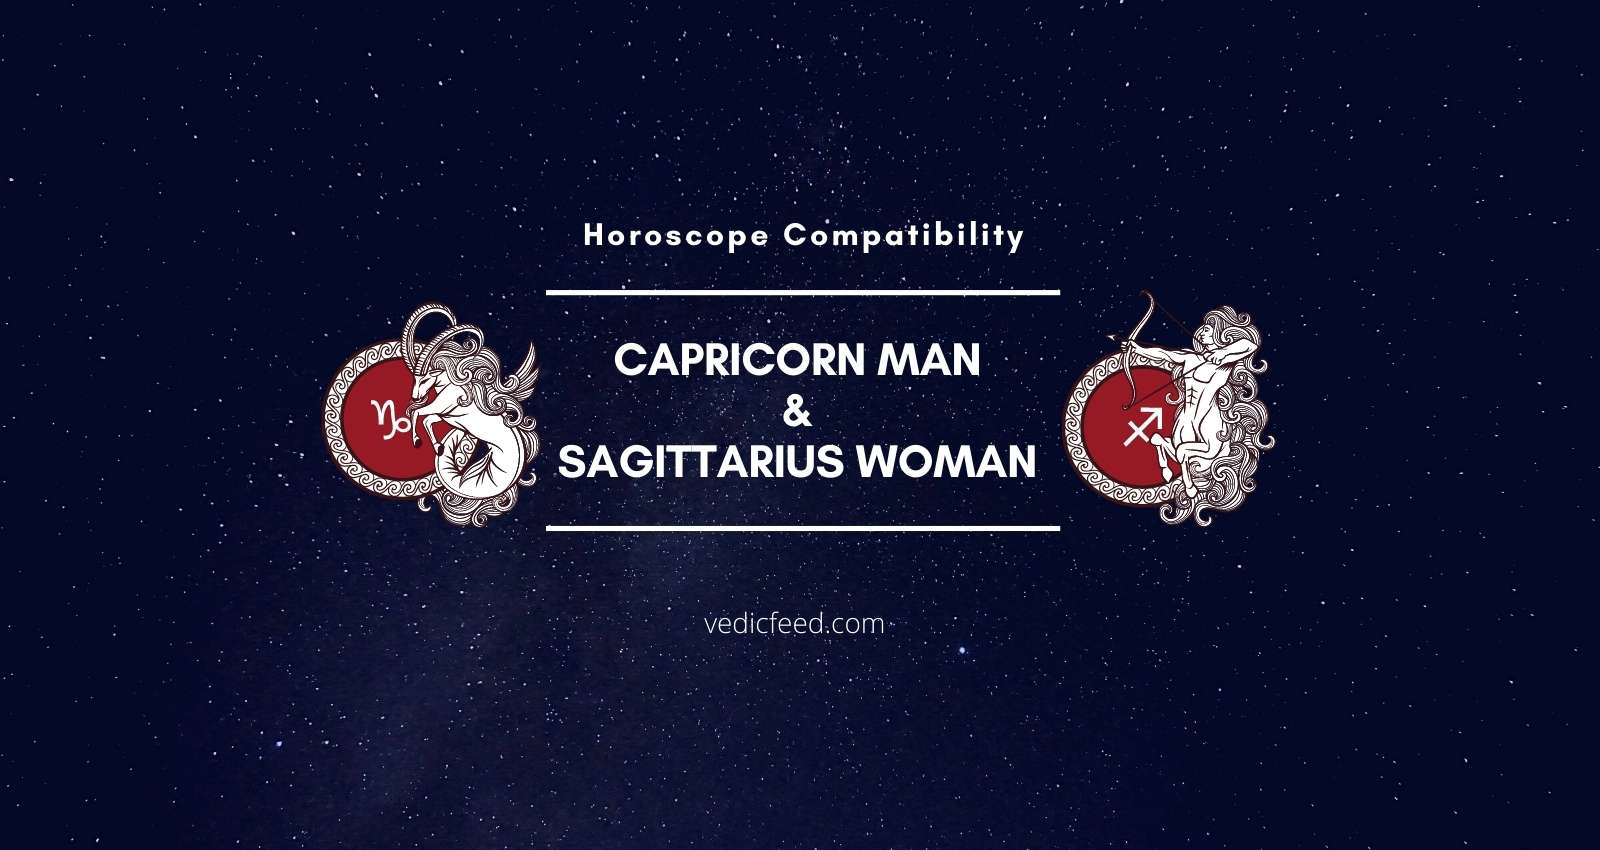 Capricorn Man and Sagittarius Woman Compatibility